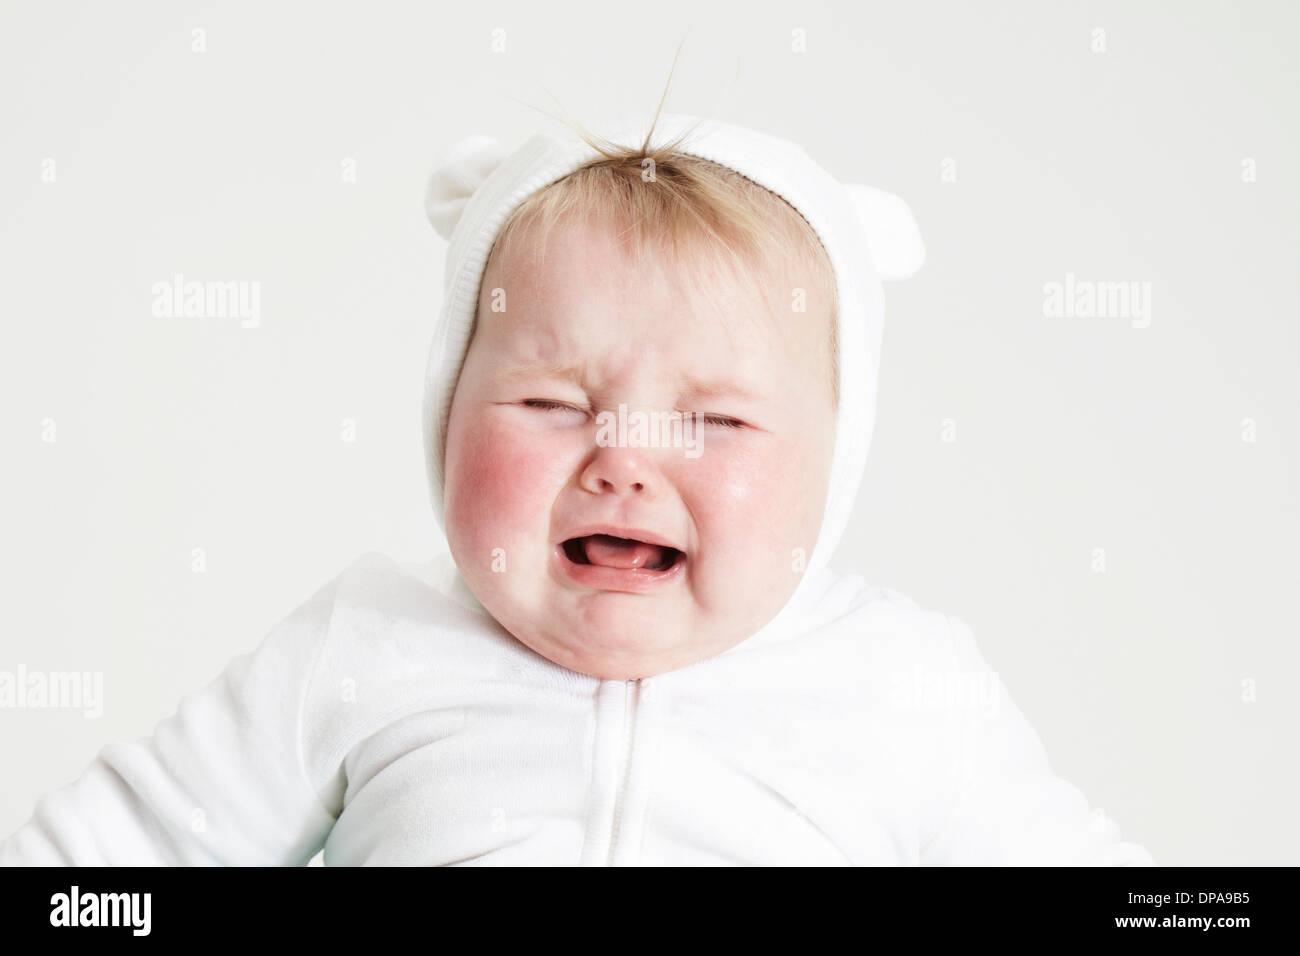 Baby Girl crying Photo Stock